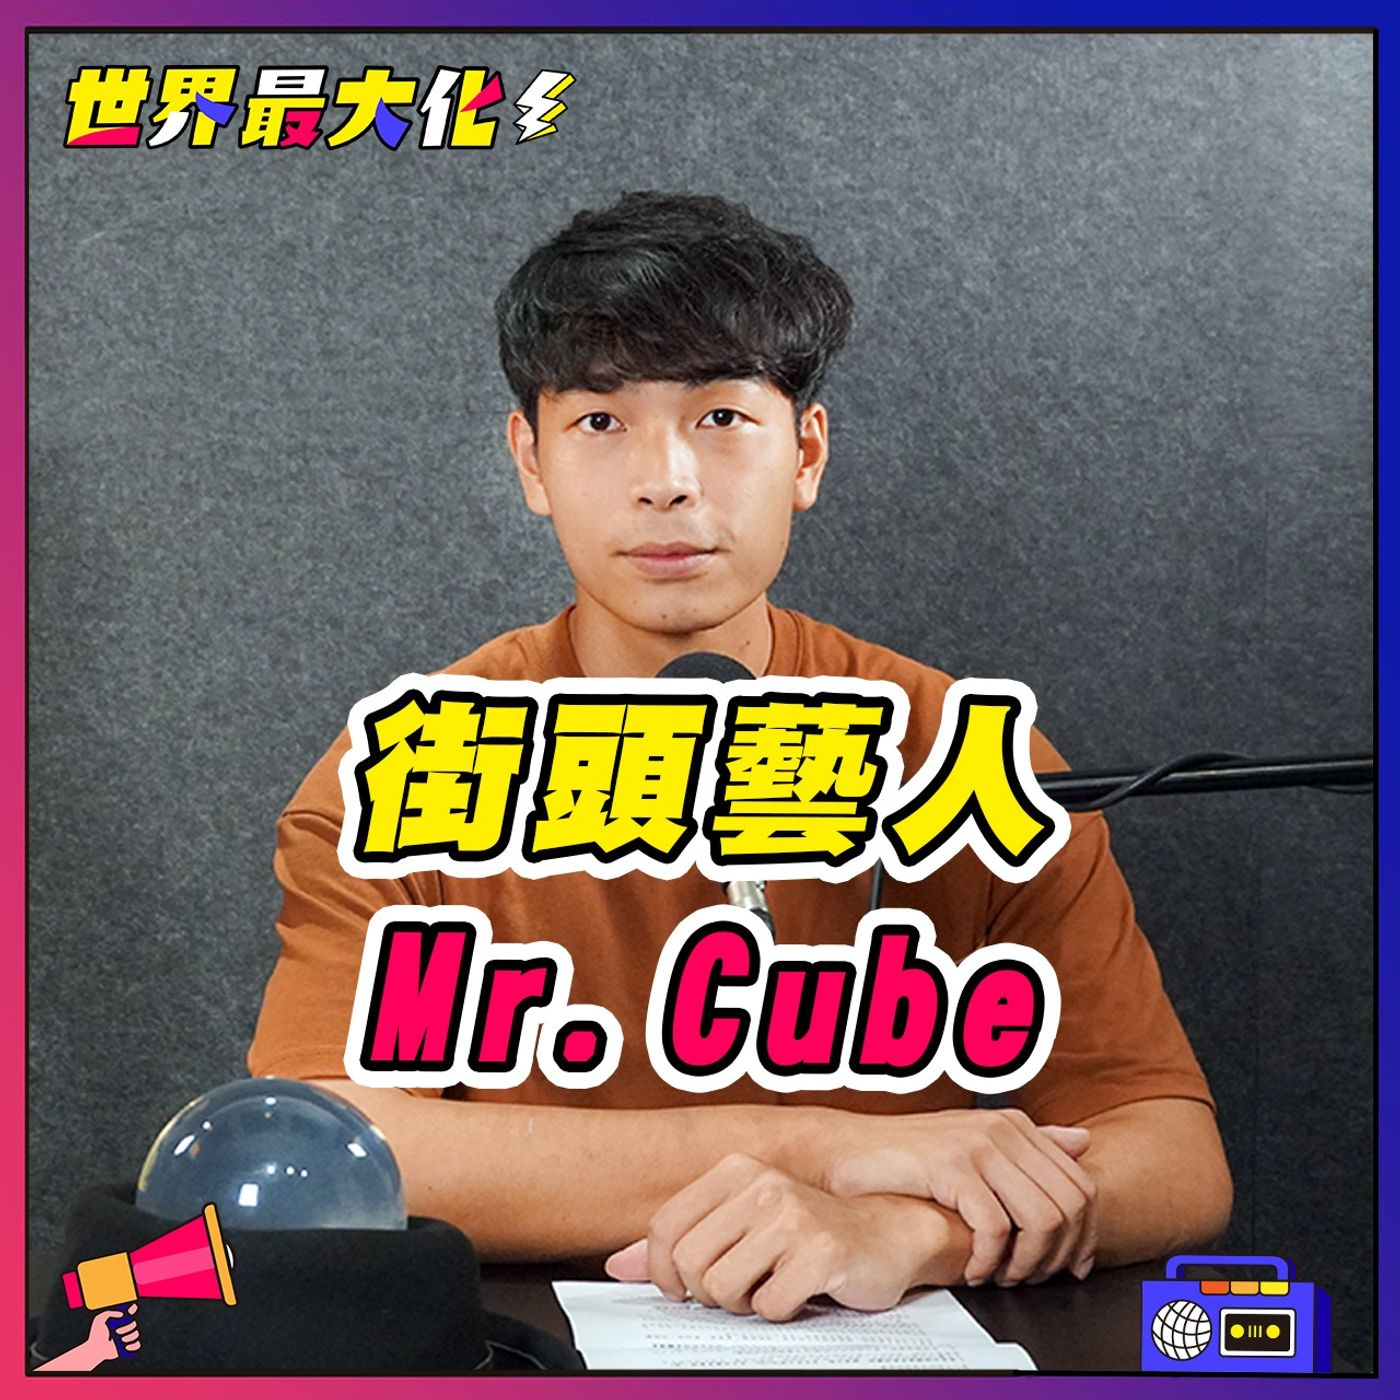 Ep.28- 從體育人變身街頭藝人再到創業家    世界最大化 feat. Mr. Cube 黃子溢